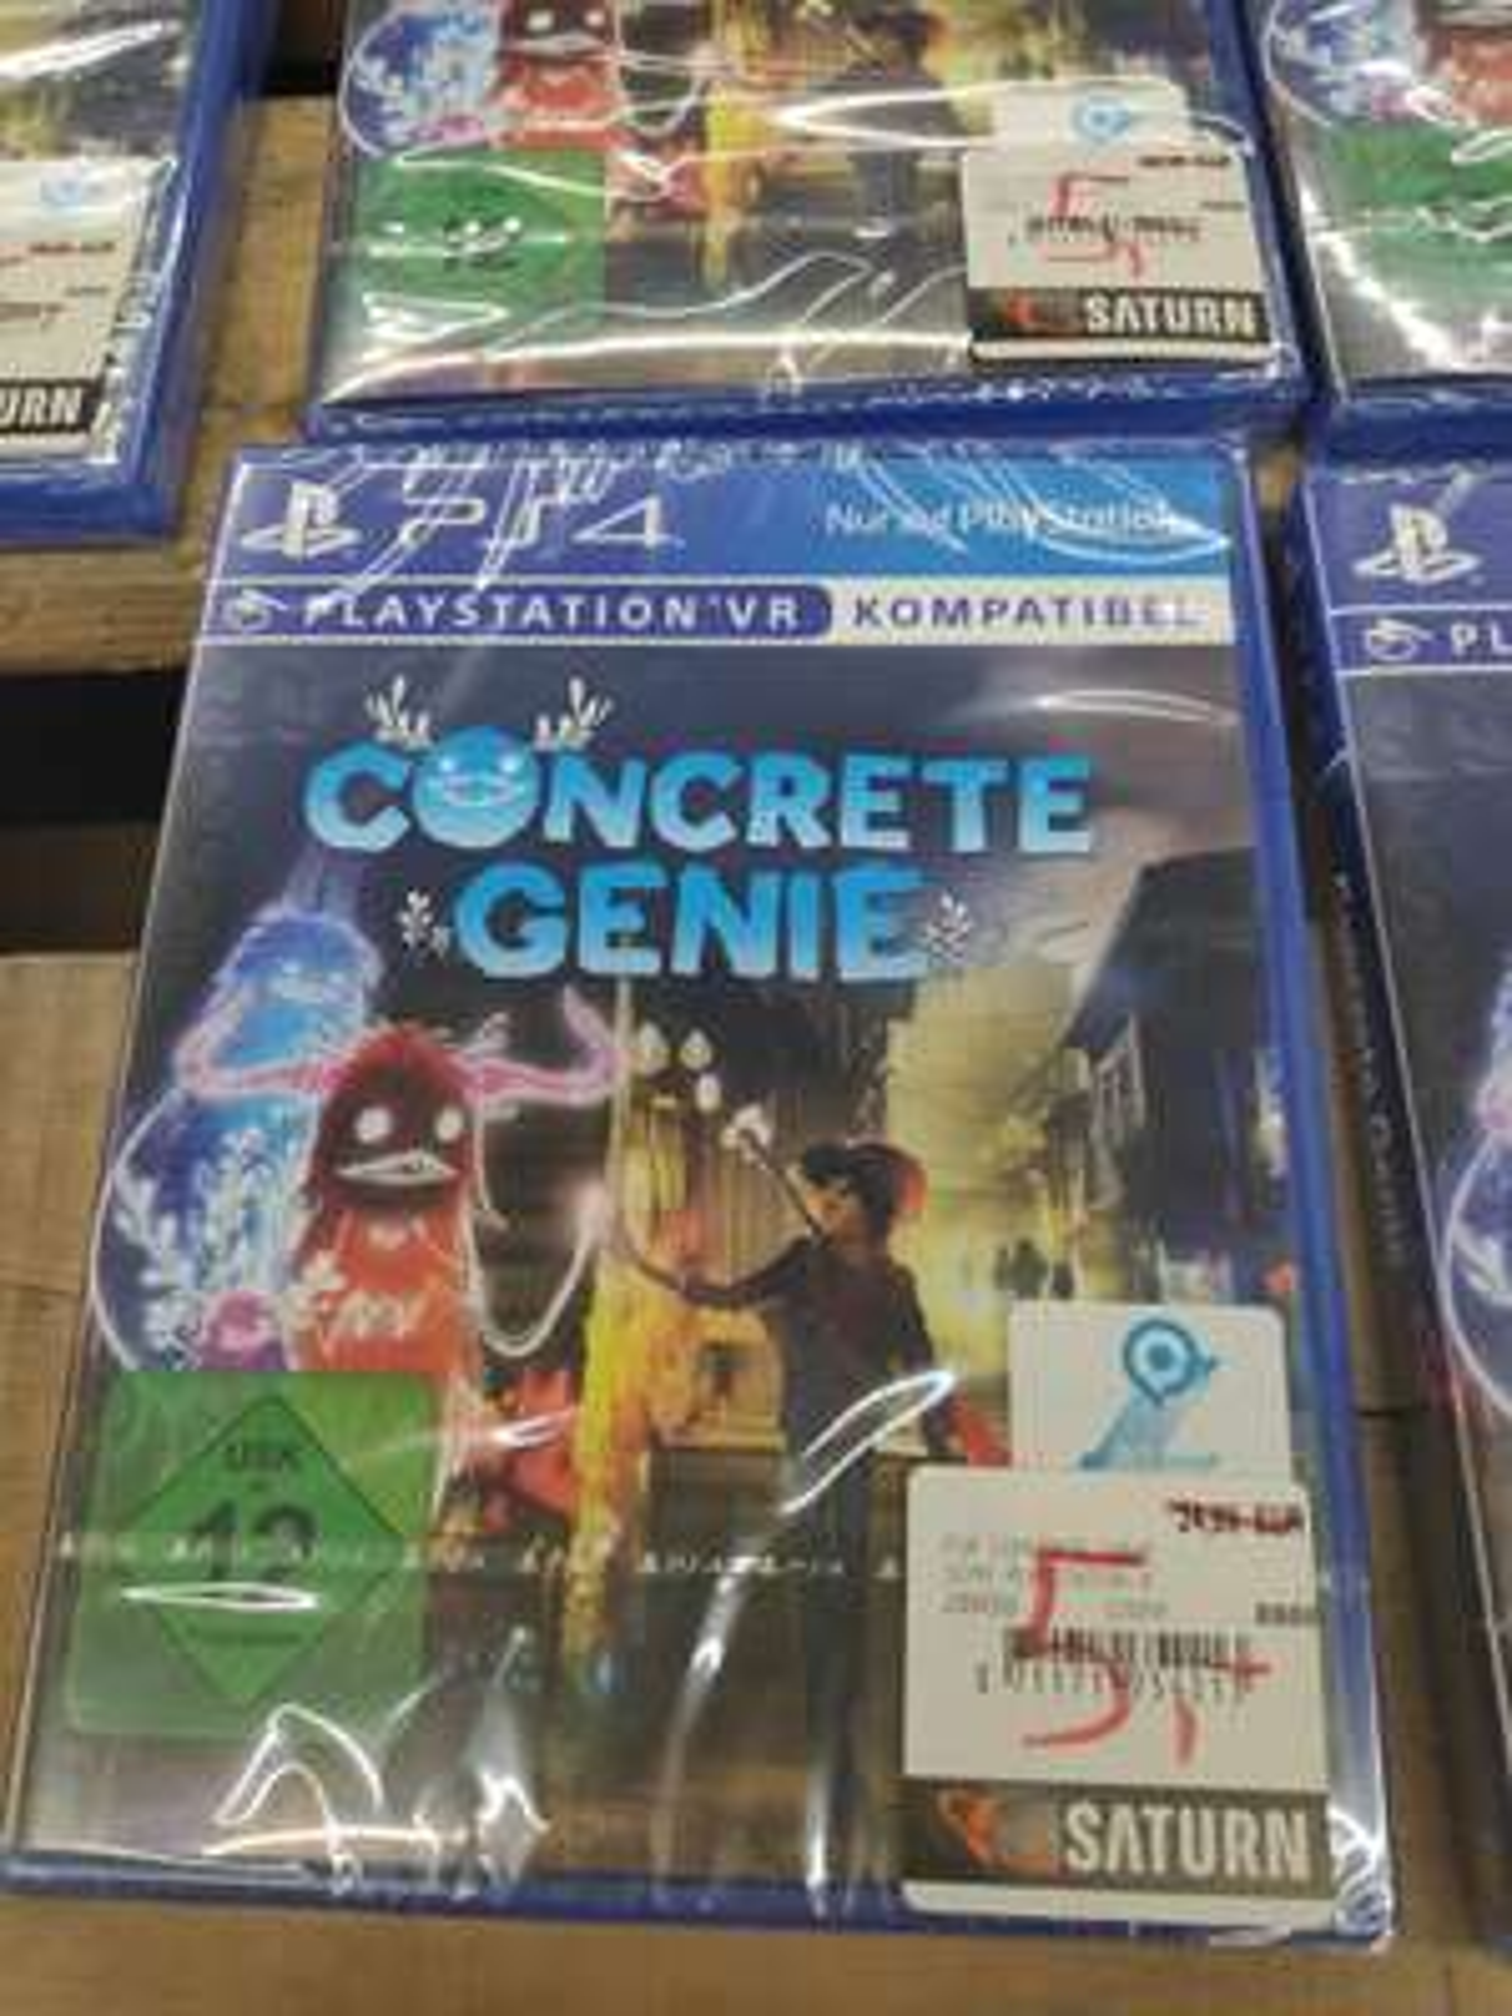 Lokal - Concrete Genie PS4 Saturn Bielefeld